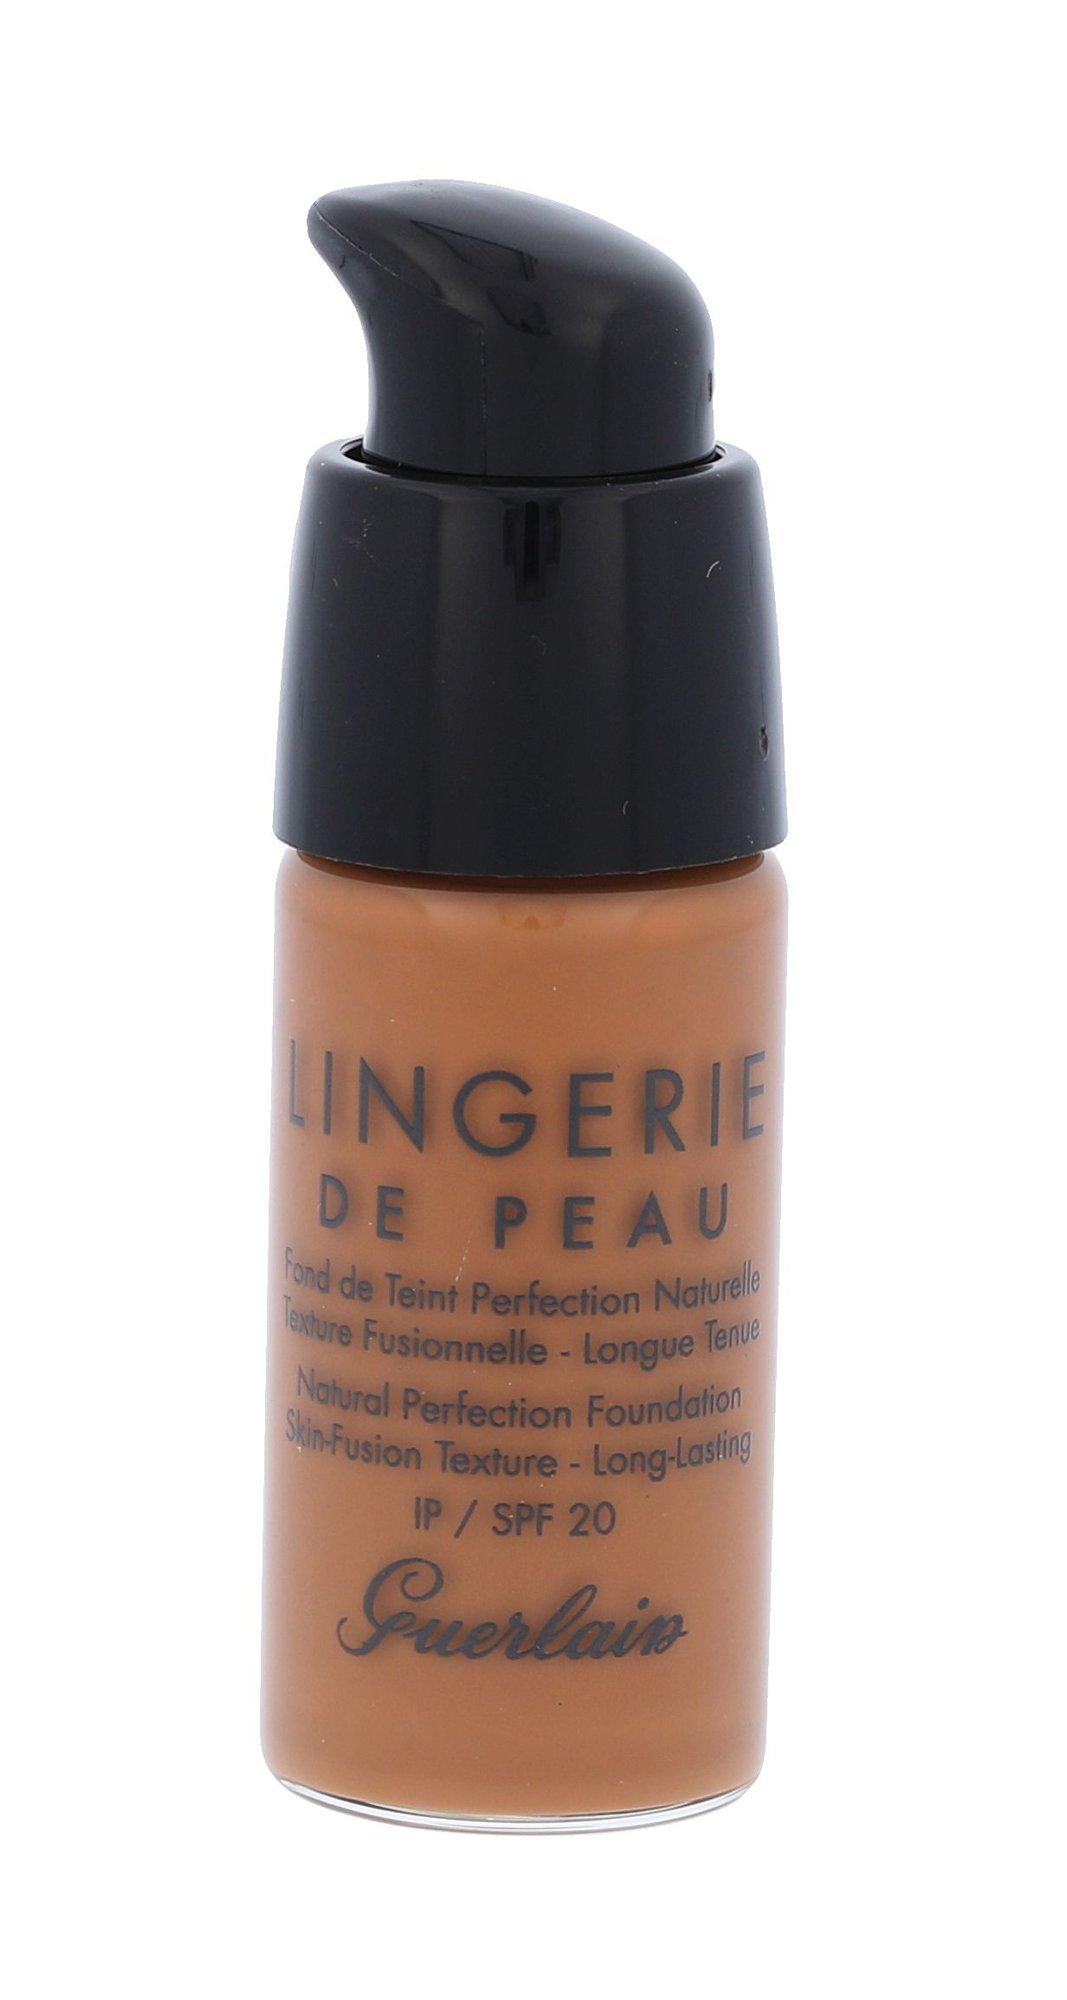 Guerlain Lingerie De Peau Cosmetic 15ml 05N Deep